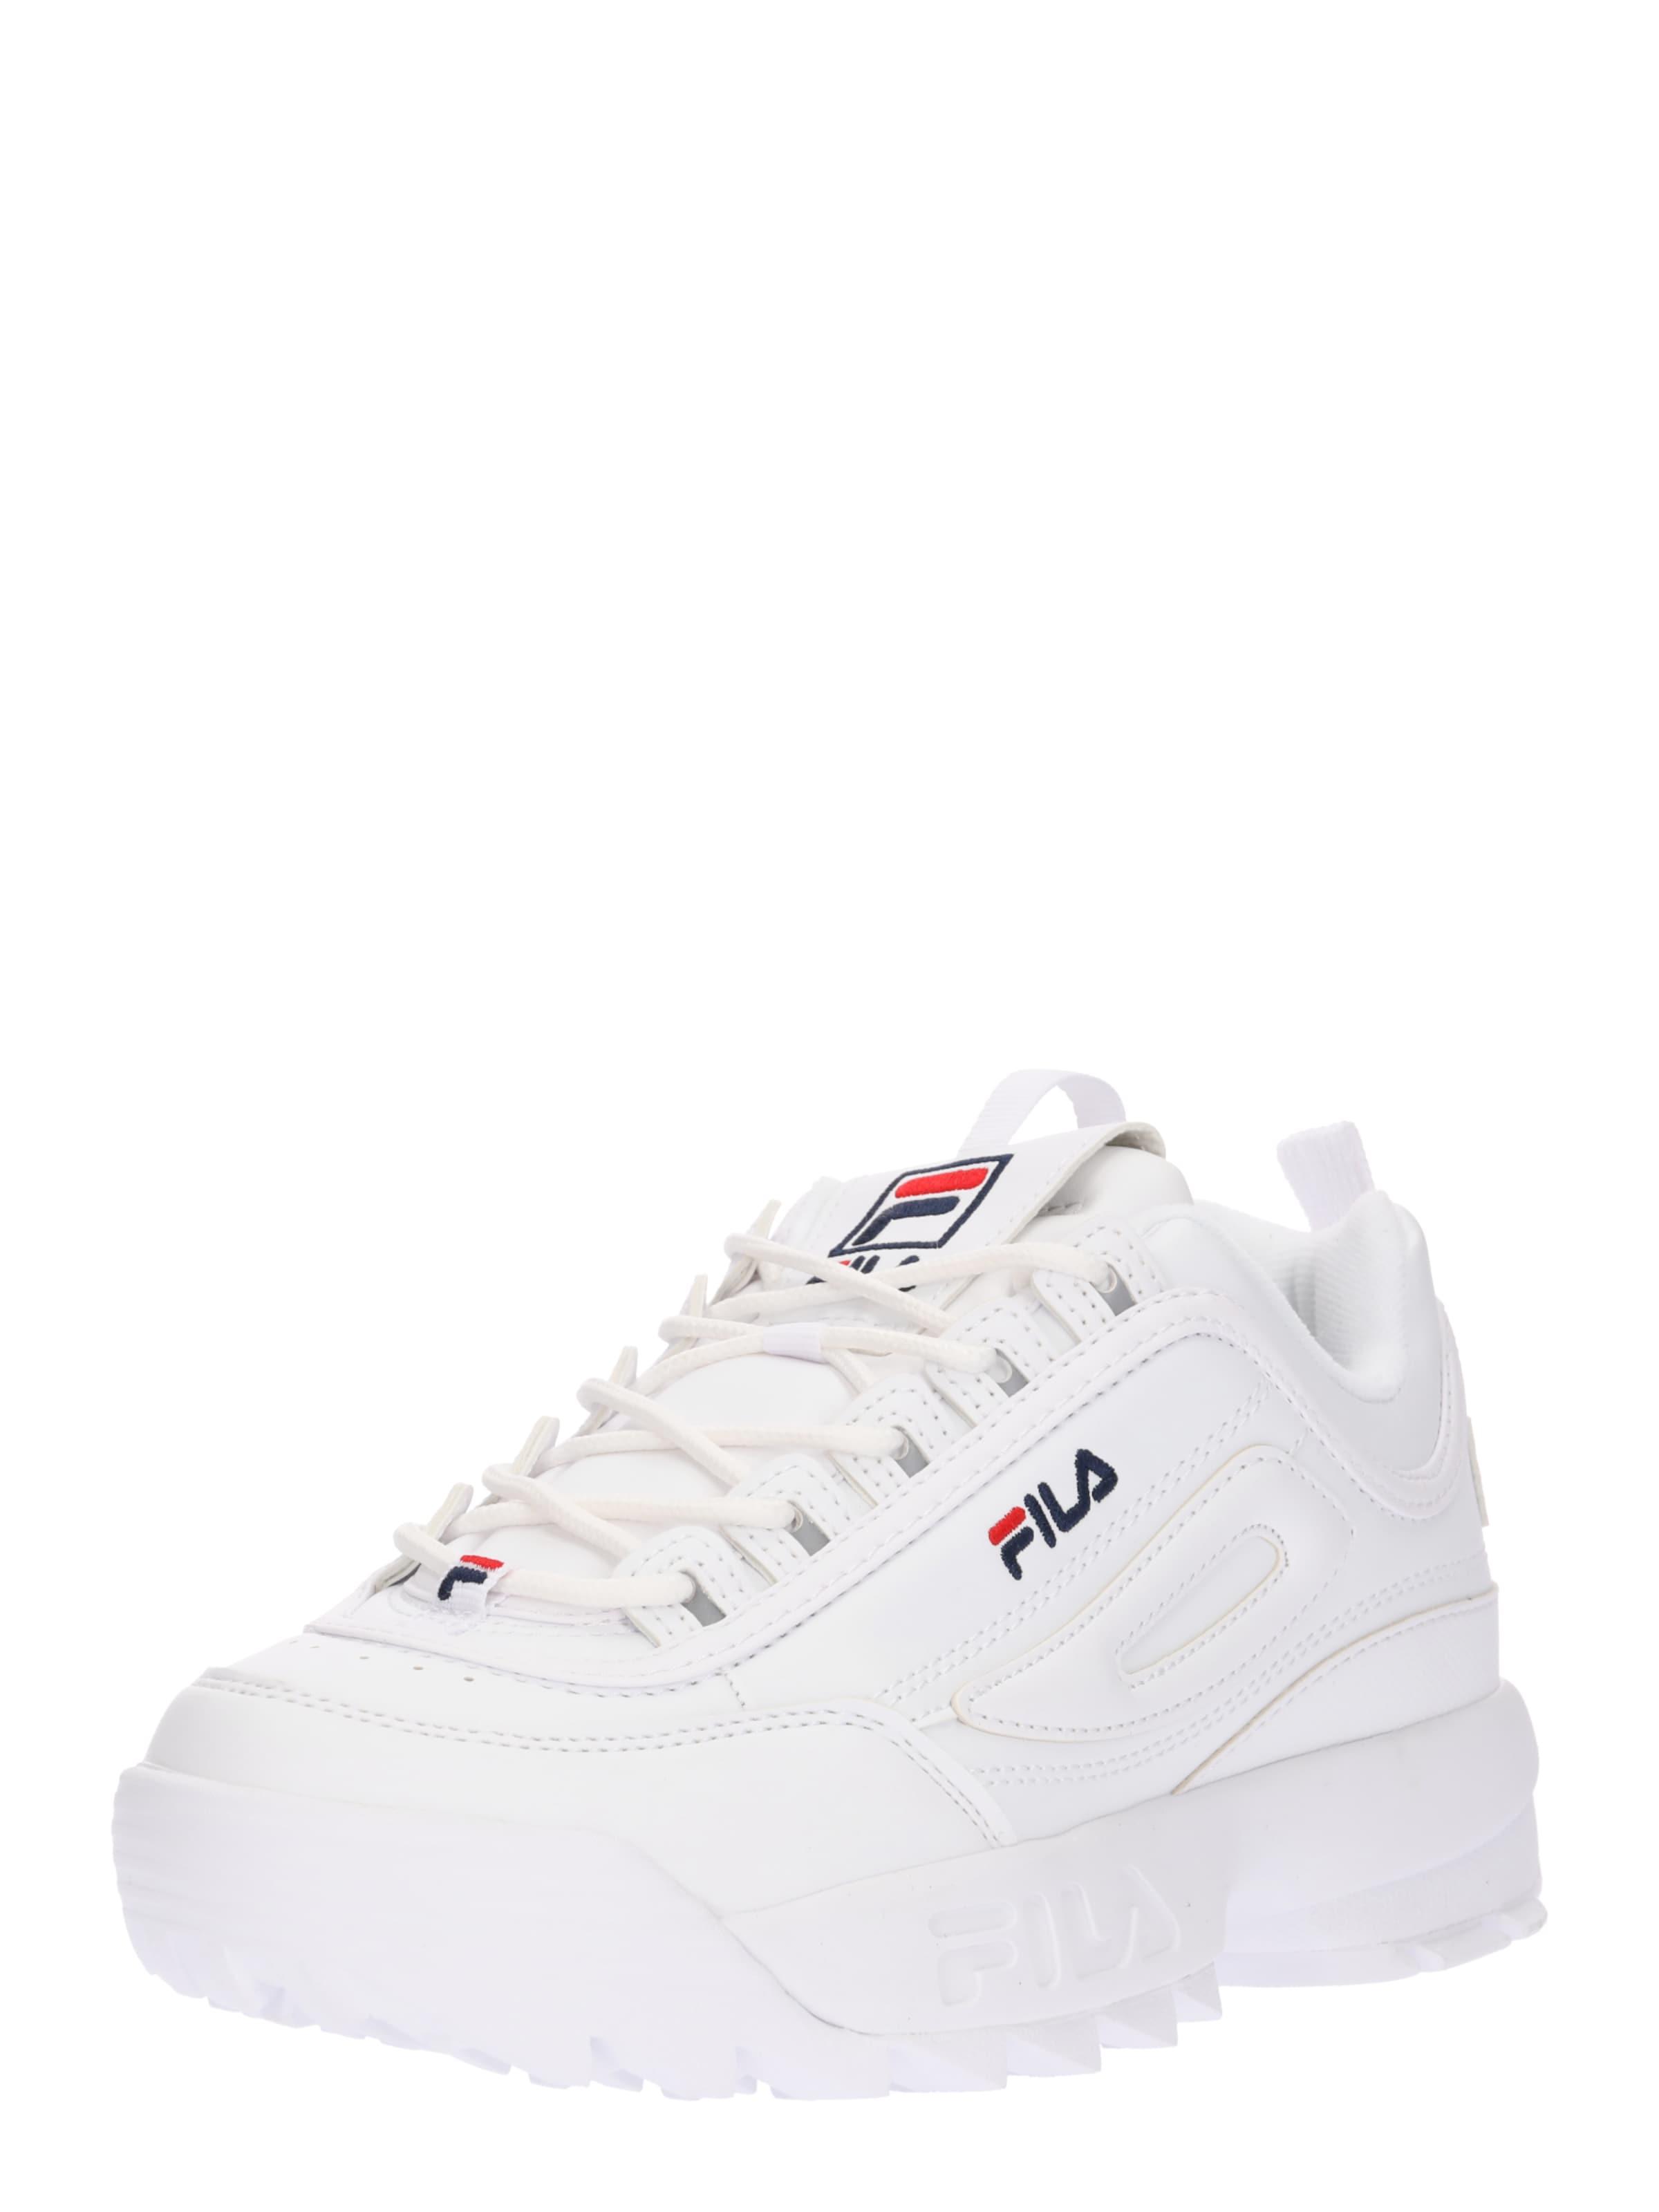 Fila In In 'disruptor' Sneaker Fila Schwarz Fila In Sneaker 'disruptor' Schwarz Sneaker 'disruptor' rxBoEeWQdC